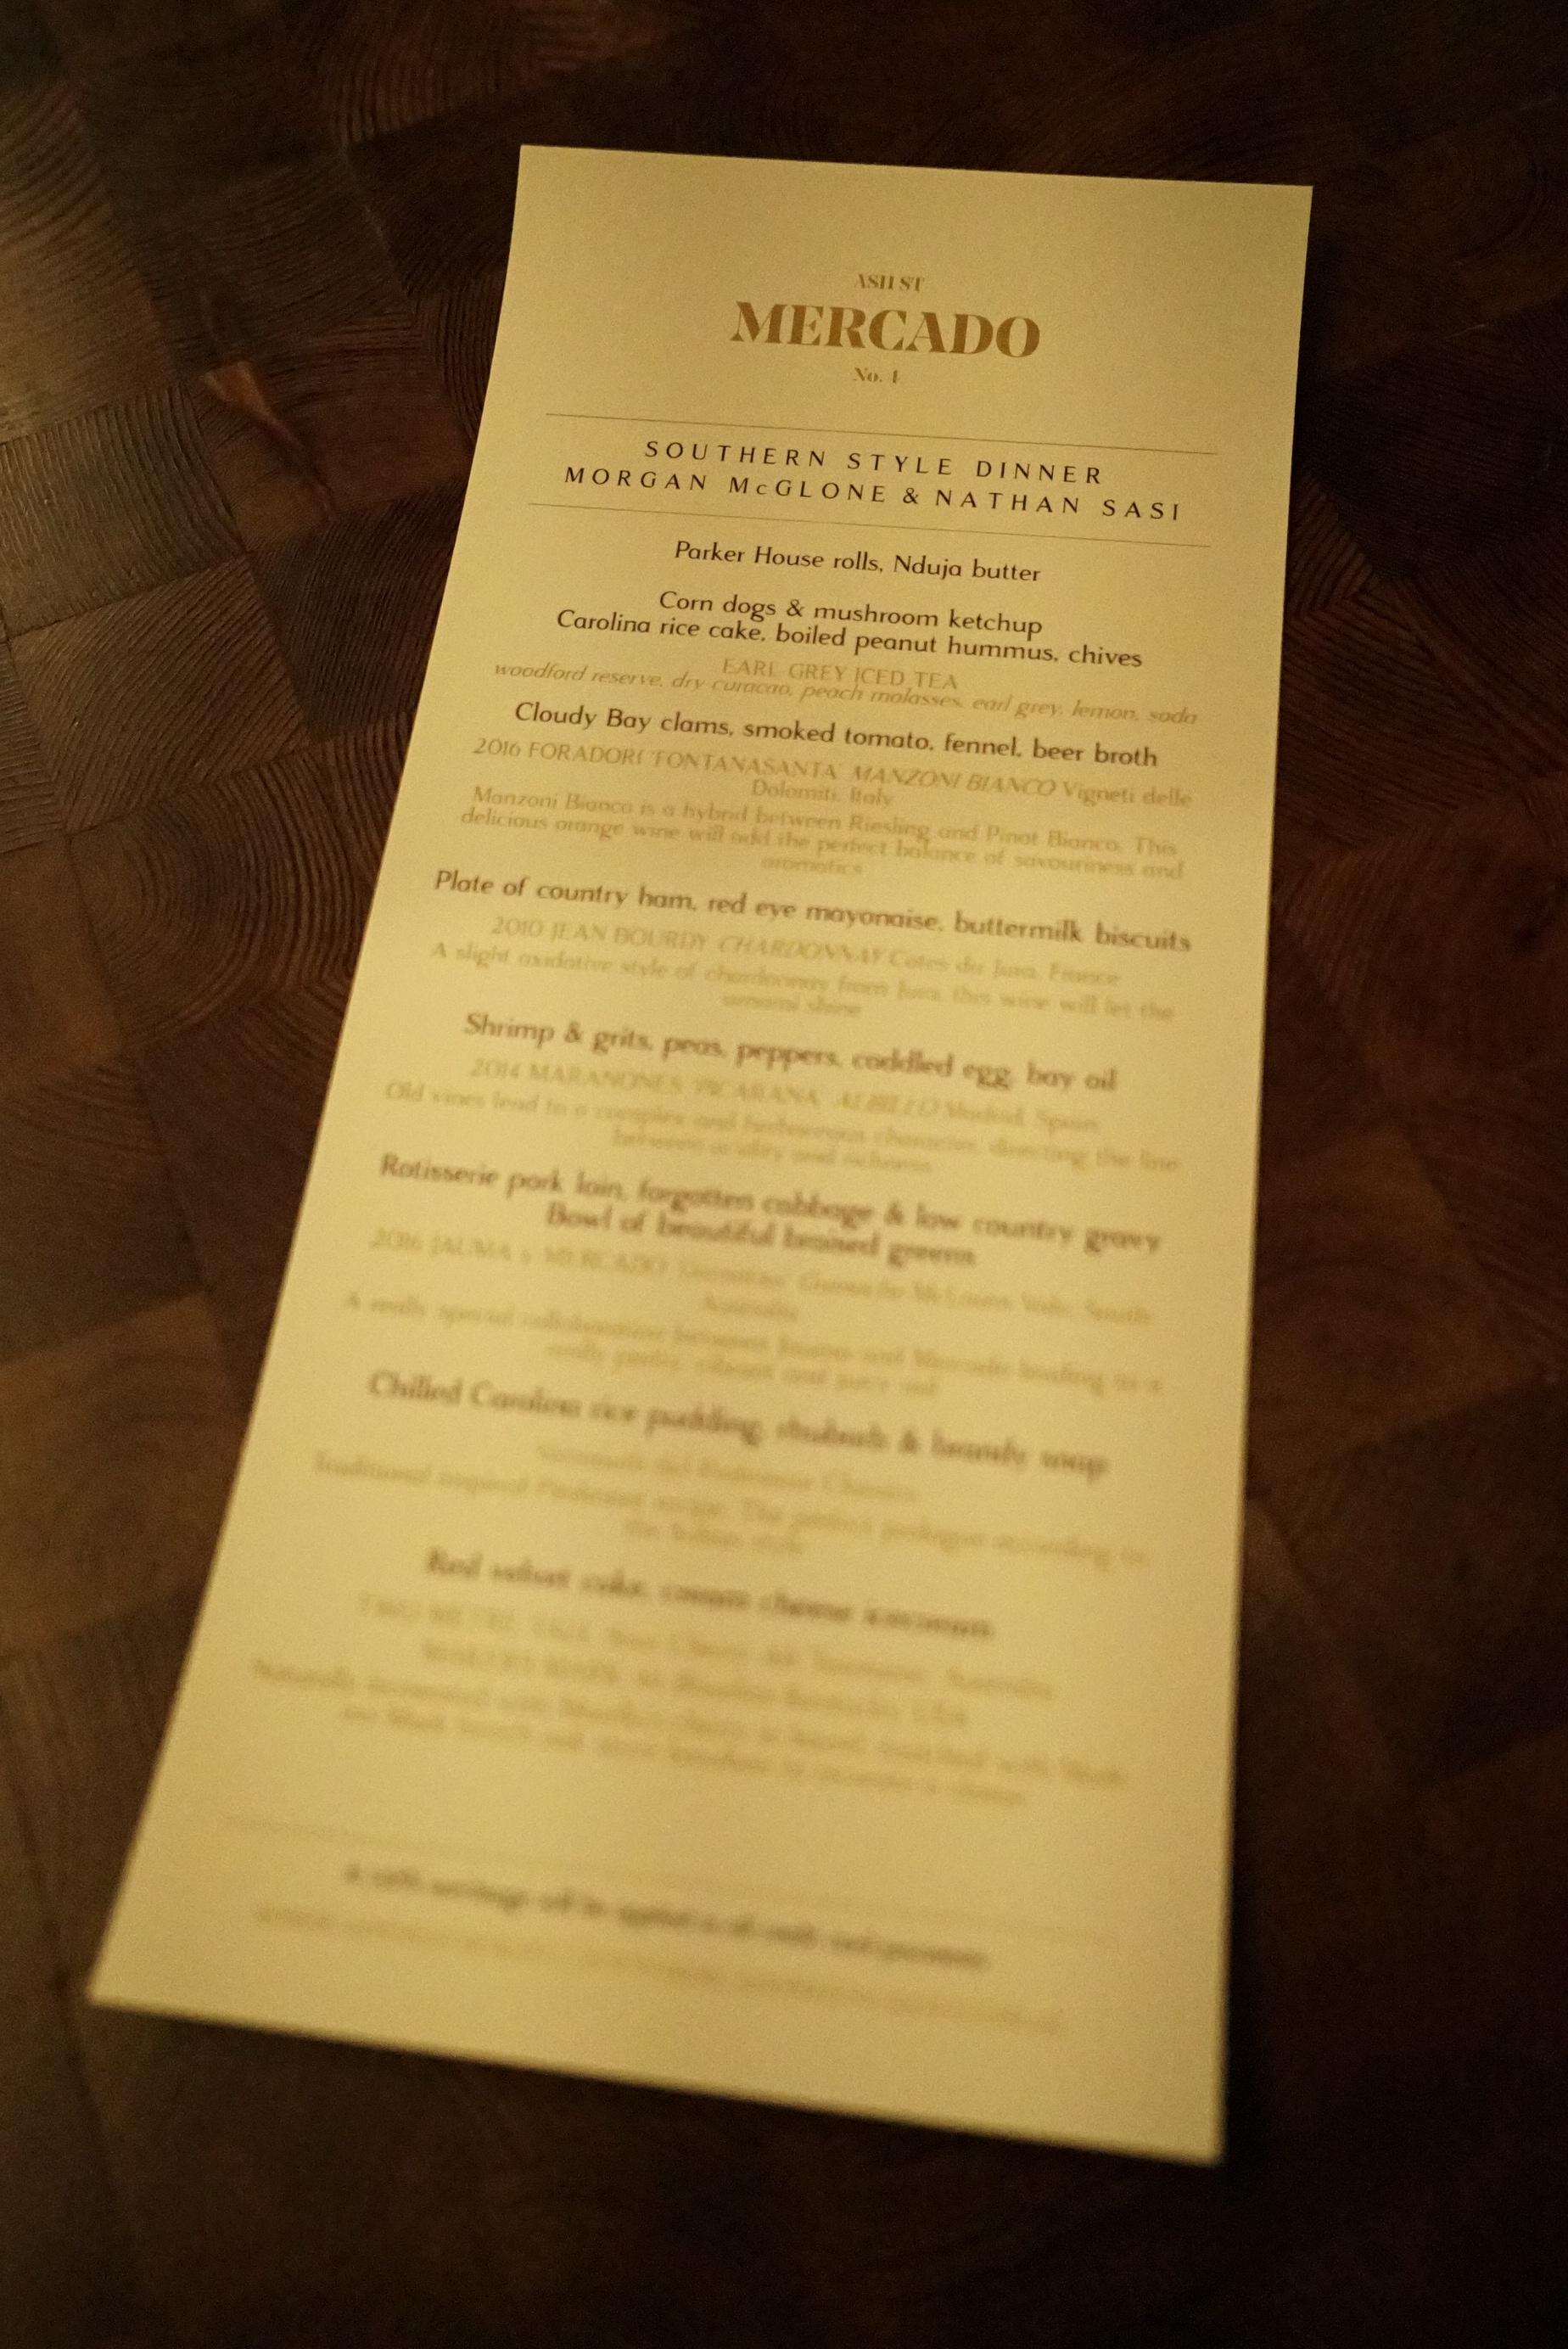 mercado southern american menu.JPG